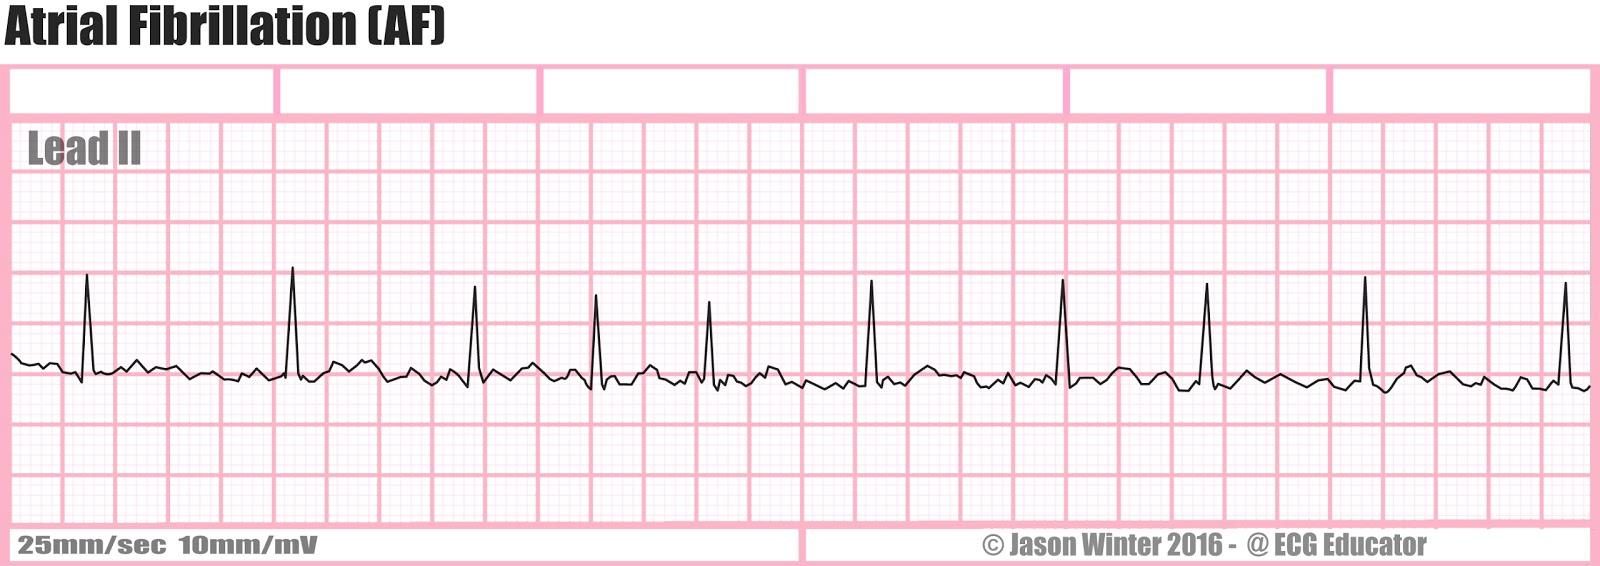 Atrial fibrillation ecg strip images 746